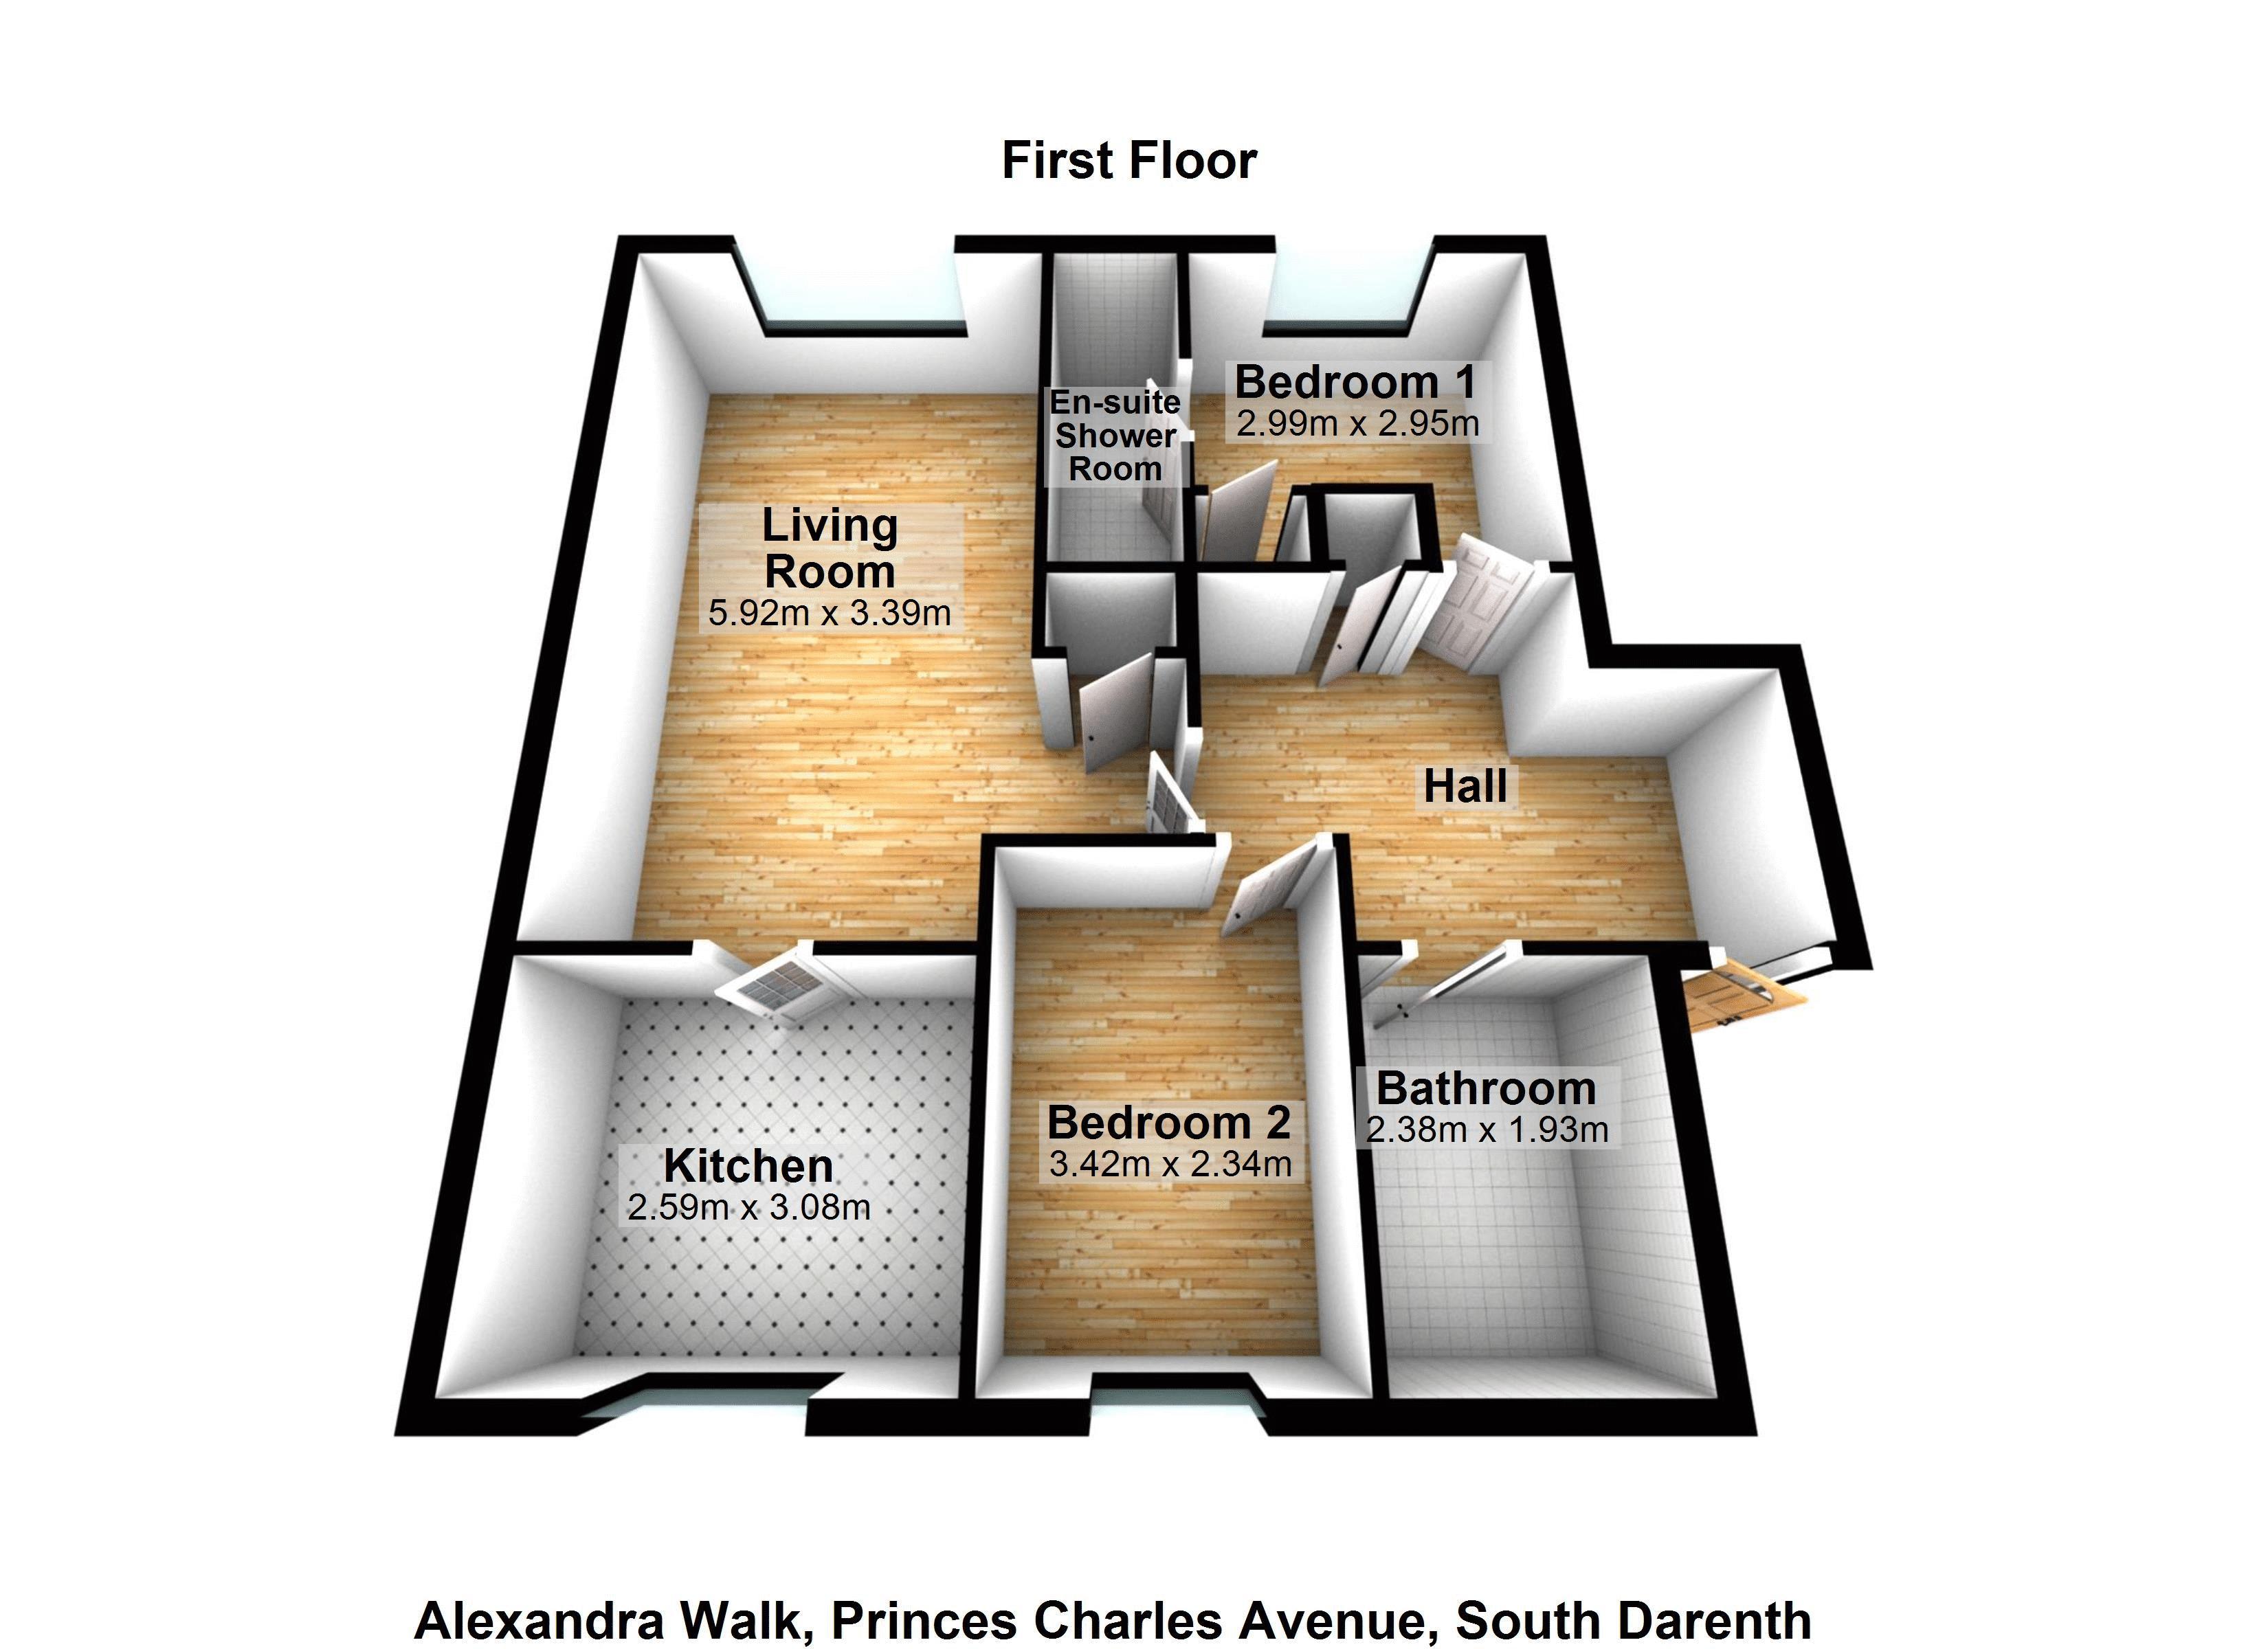 Alexandra Walk, Prince Charles Avenue South Darenth